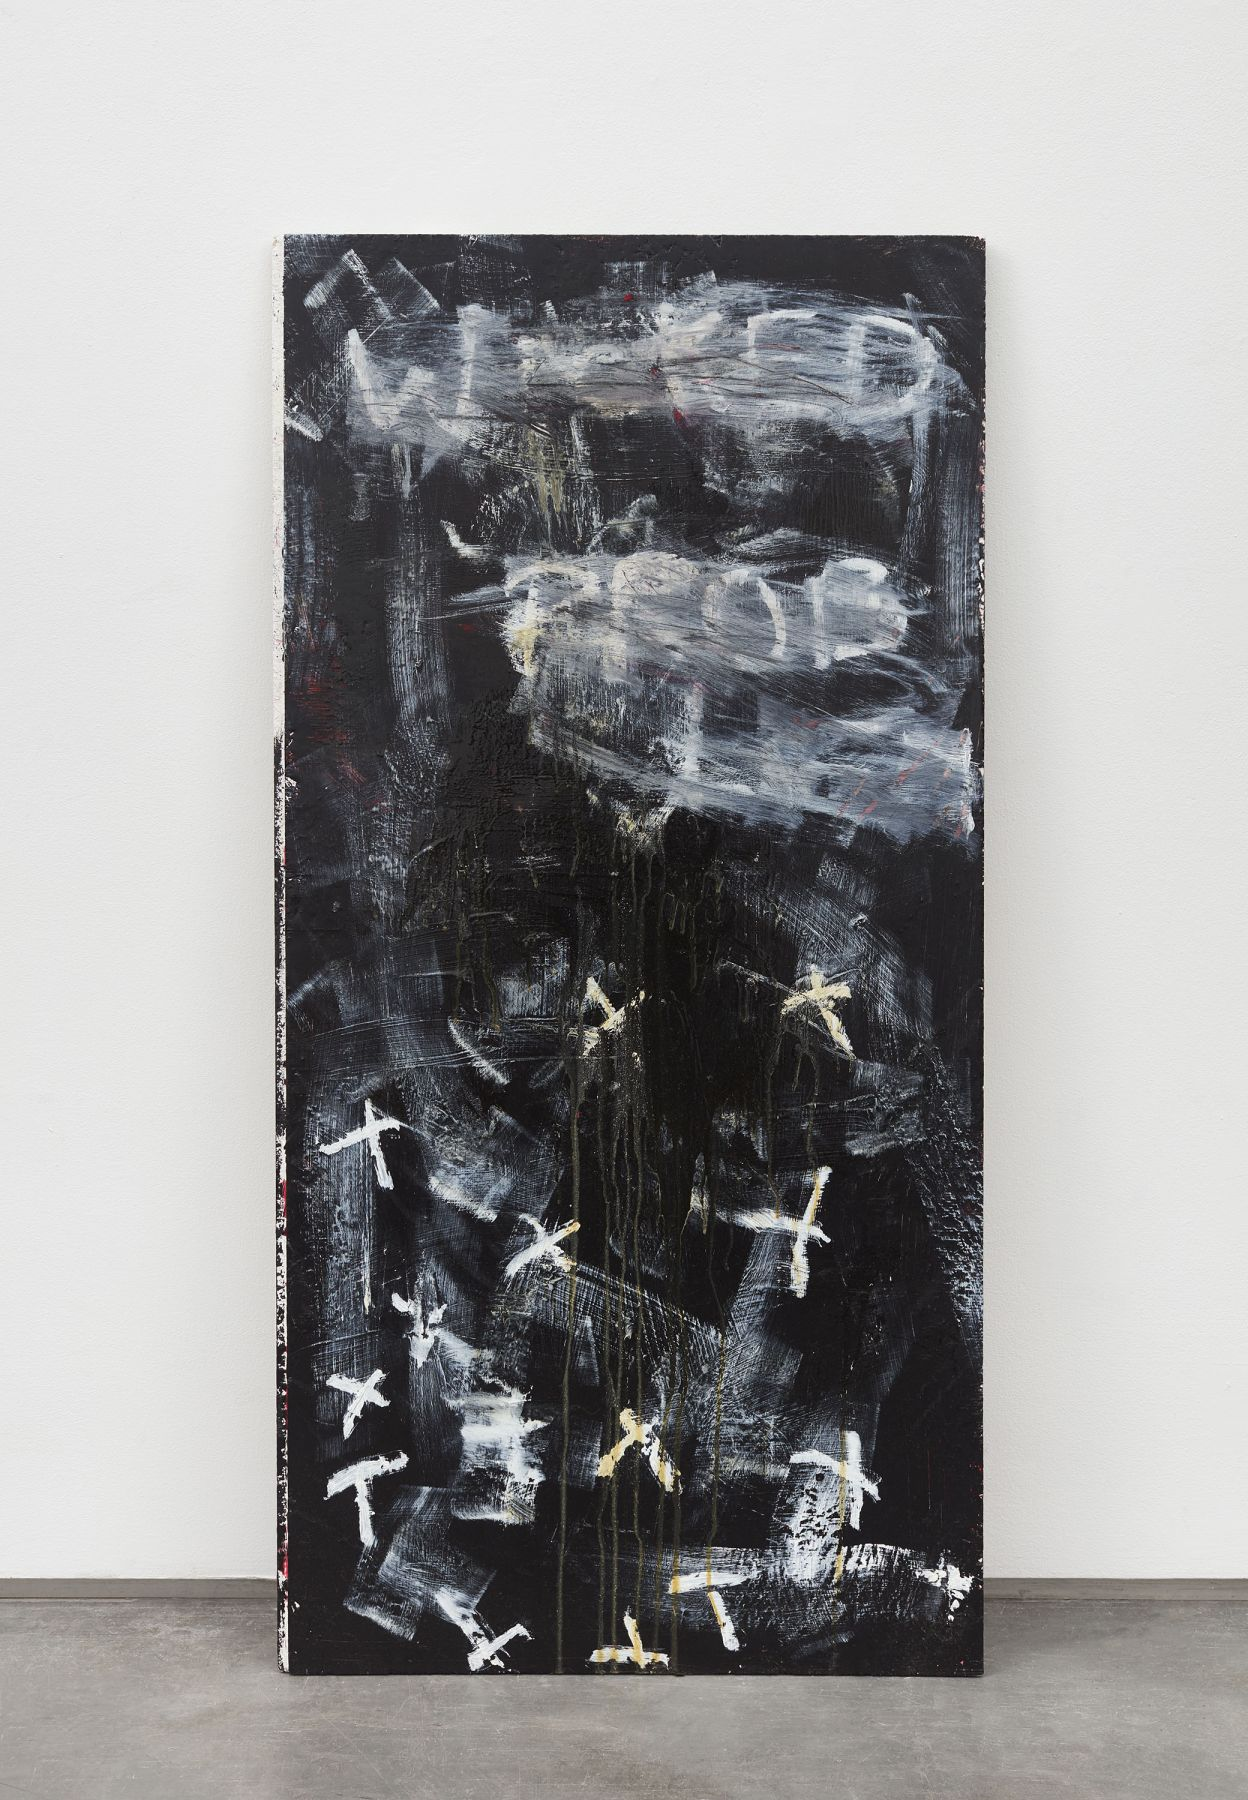 Large canvas painting with black acrylic paint by Allison Janae Hamilton